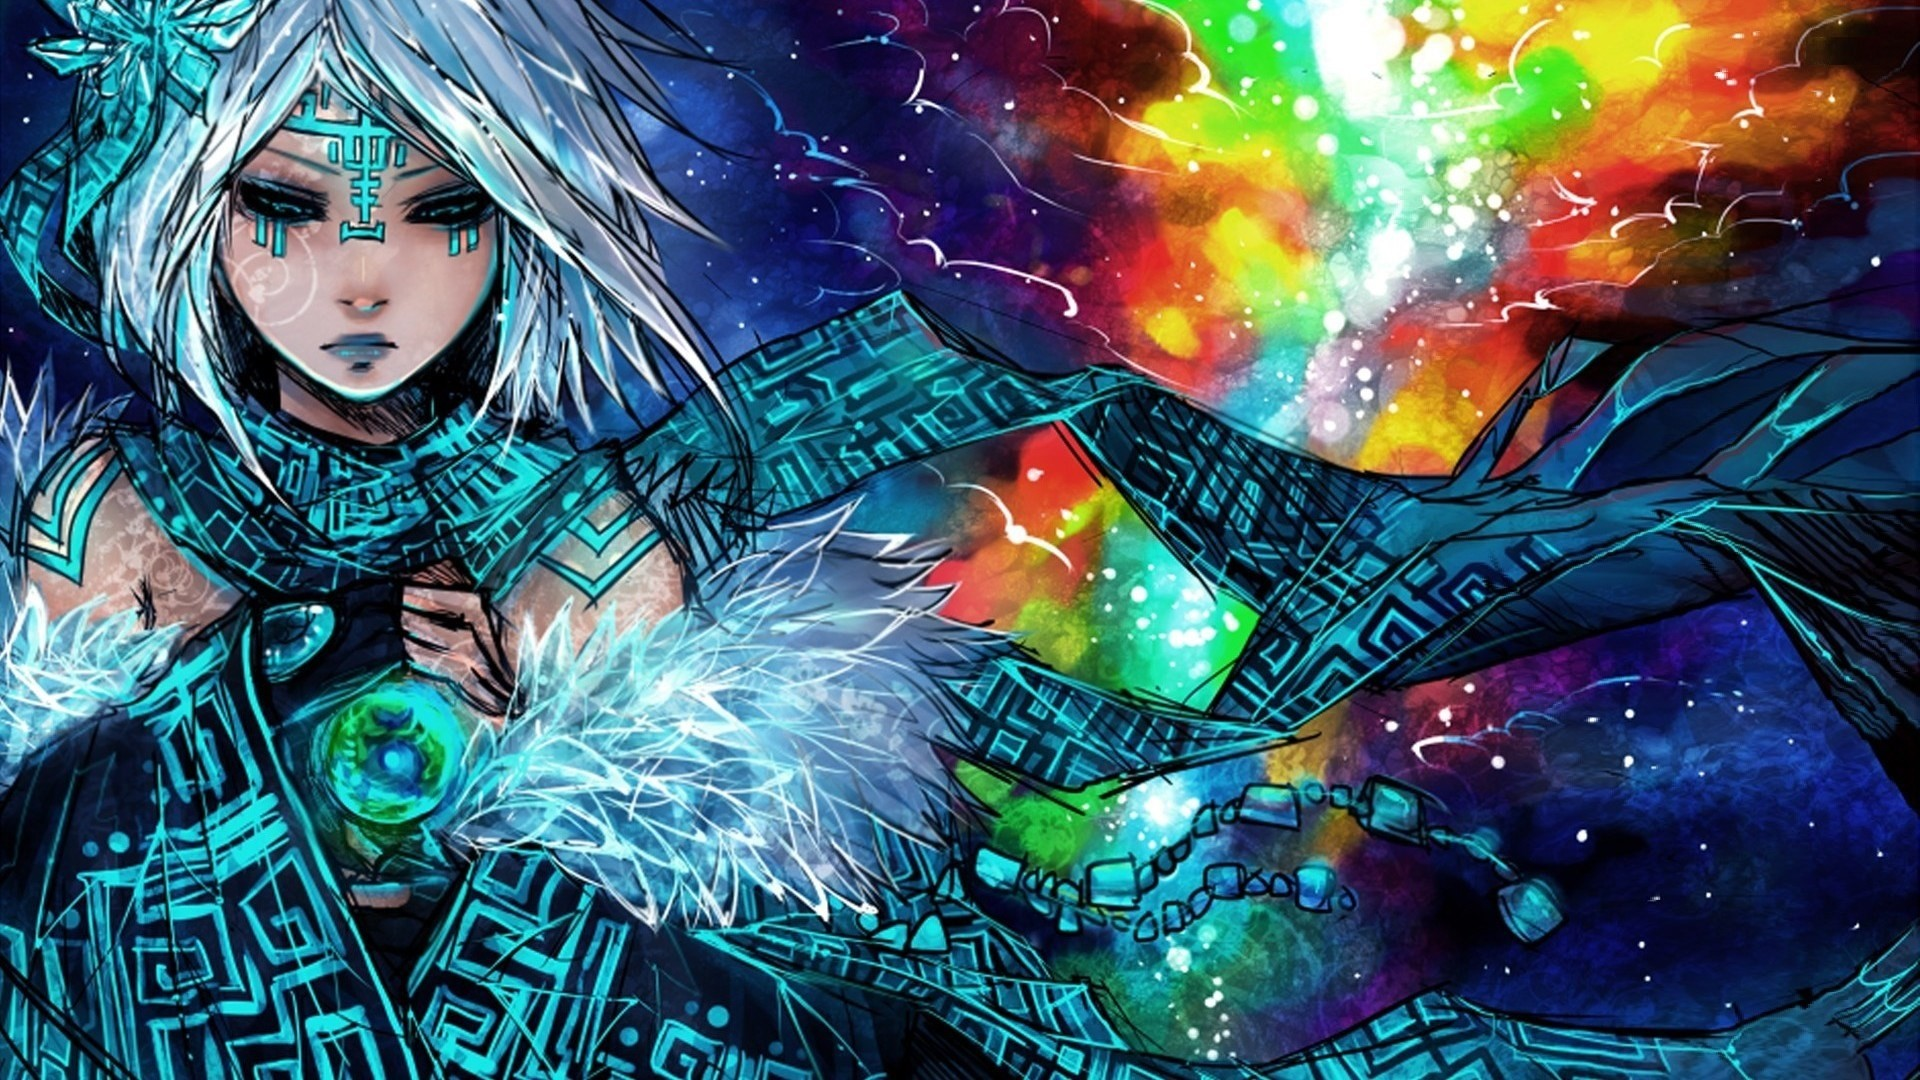 tribal mage hd anime wallpaper · Hd Anime Wallpapers